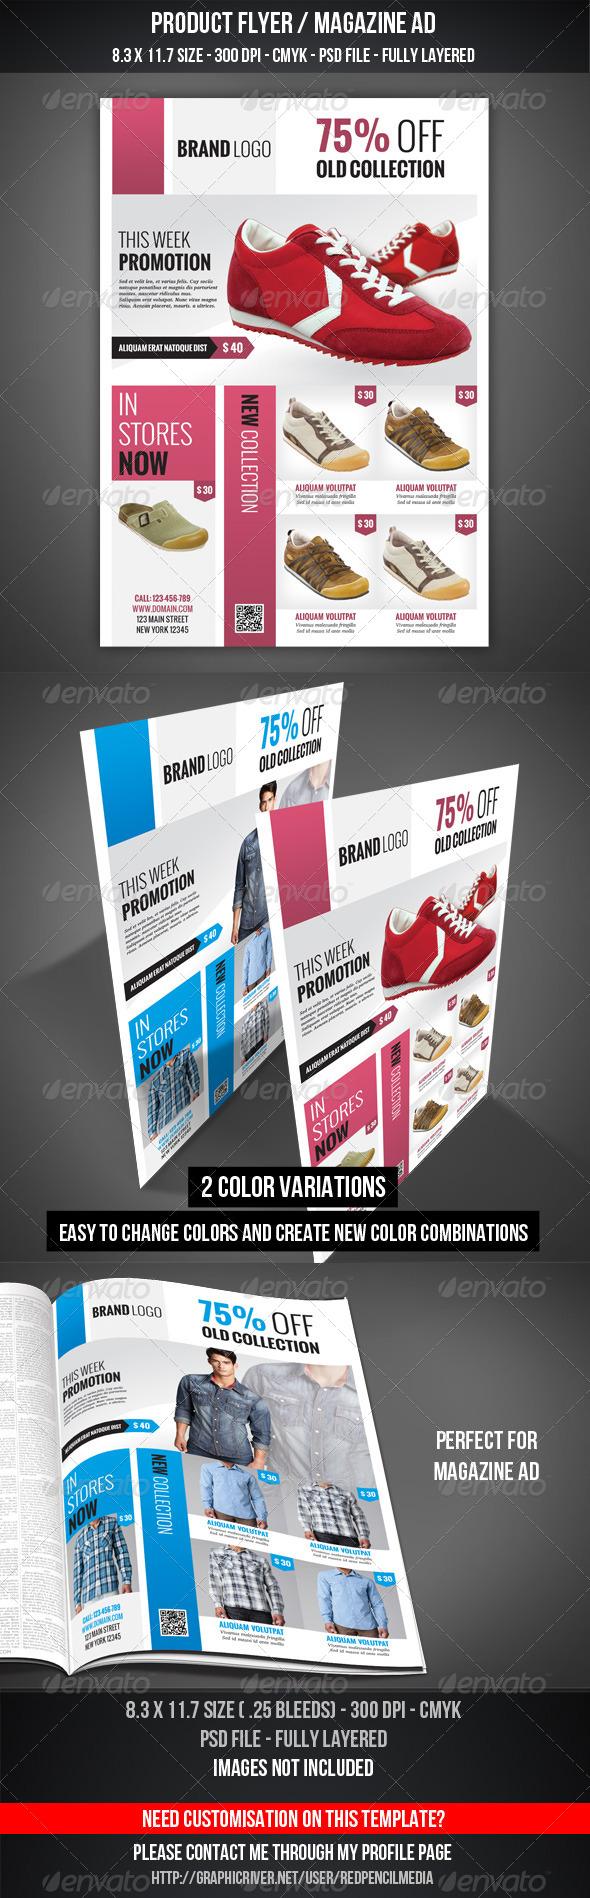 GraphicRiver Product Flyer Magazine AD 4564634